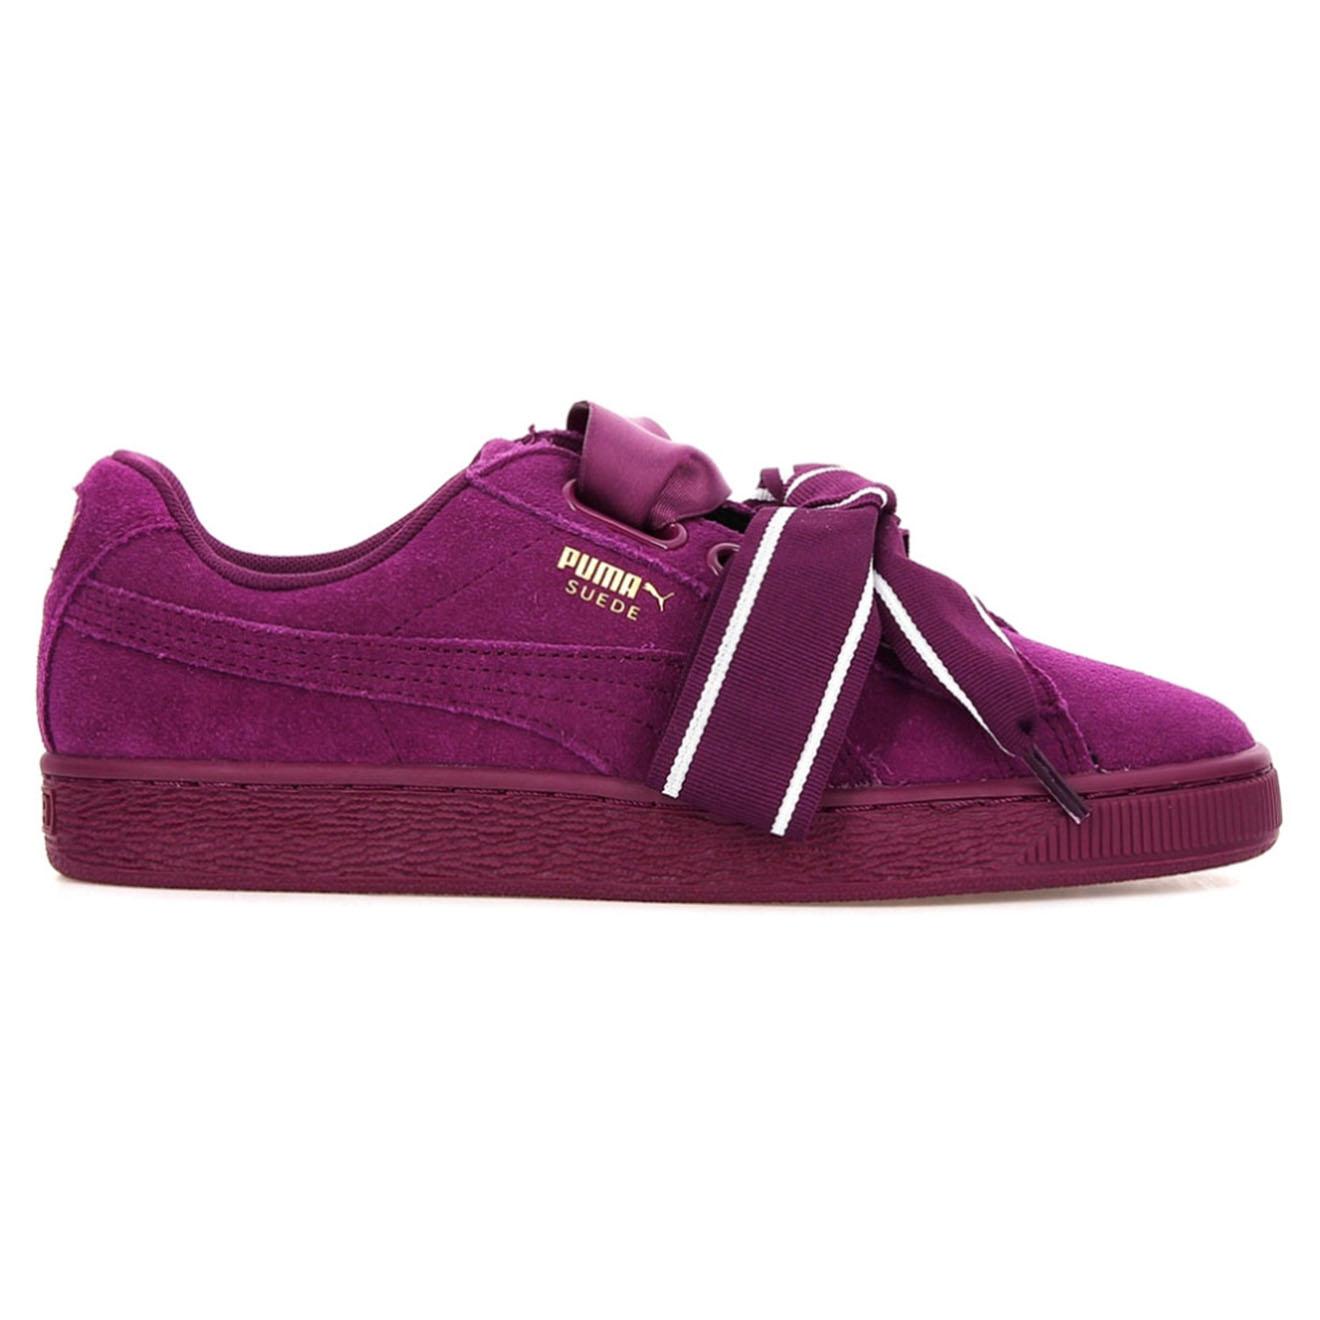 Baskets en Velours de Cuir Heart Satin II Wn's violettes - Puma - Modalova